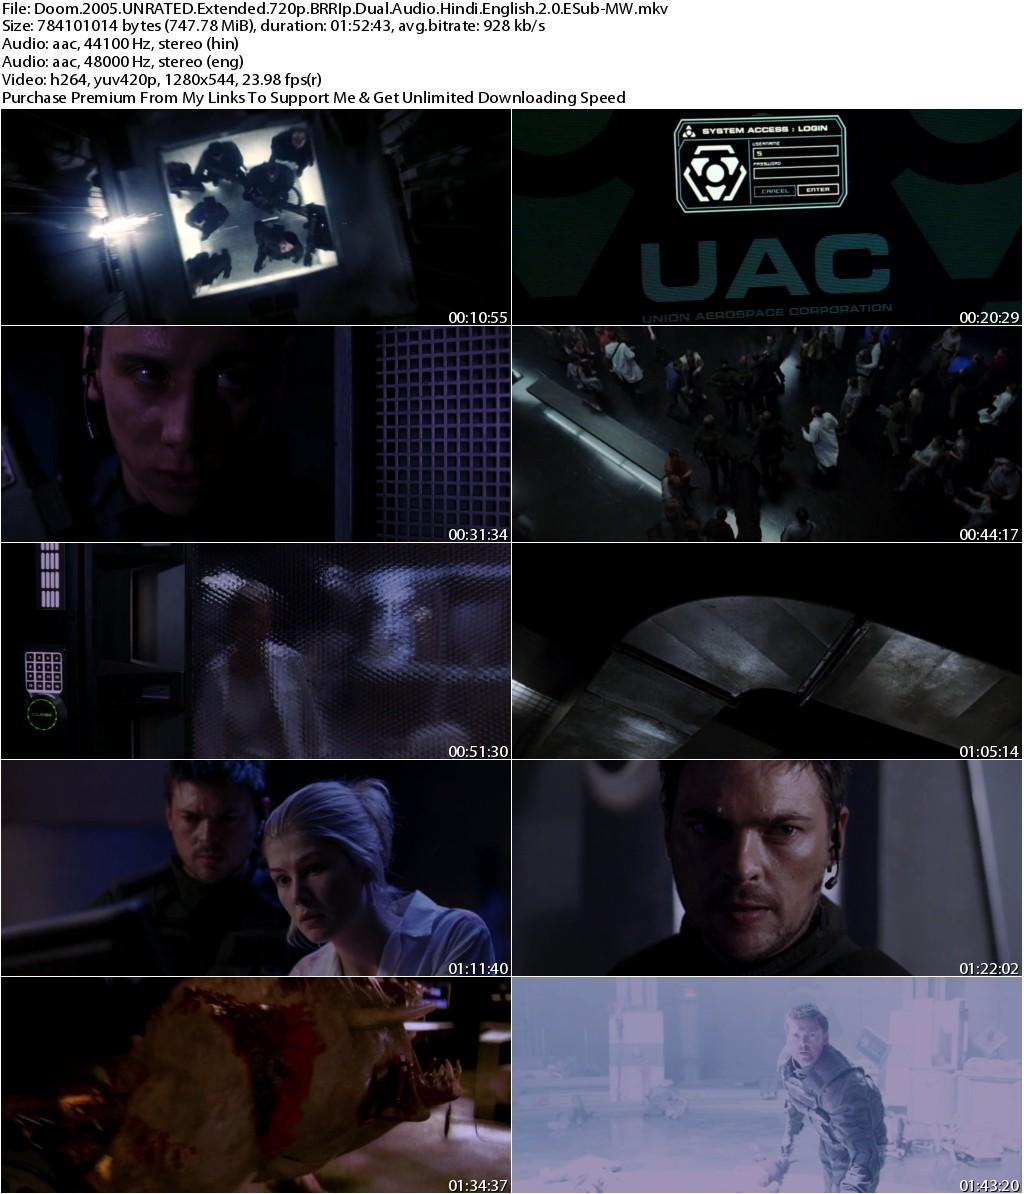 Doom (2005) UNRATED Extended 720p BRRIp Dual Audio [Hindi+English] ESub-MW